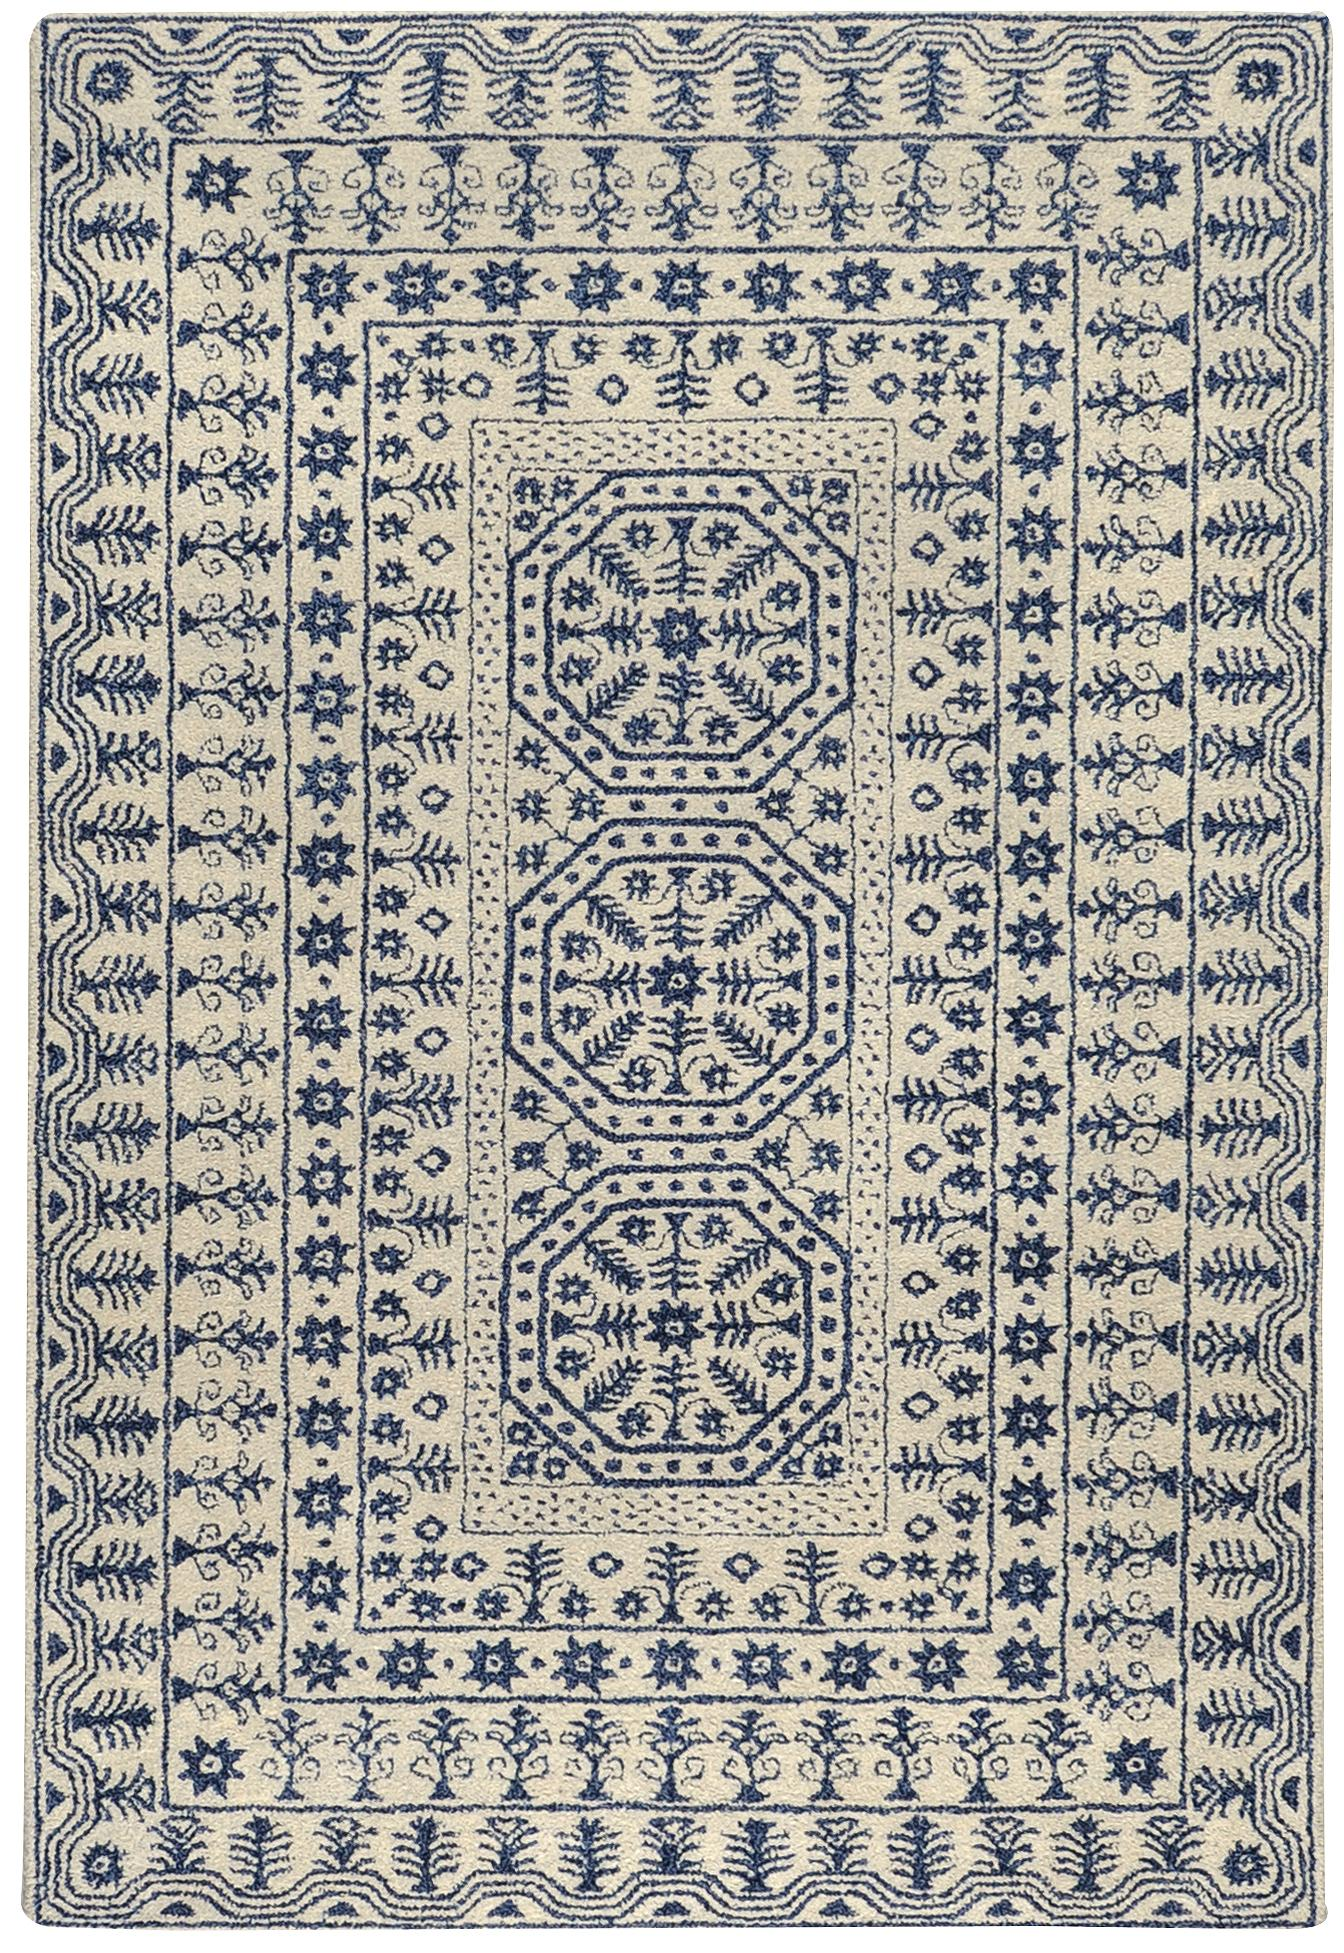 Surya Rugs Smithsonian 9' x 13' - Item Number: SMI2113-913